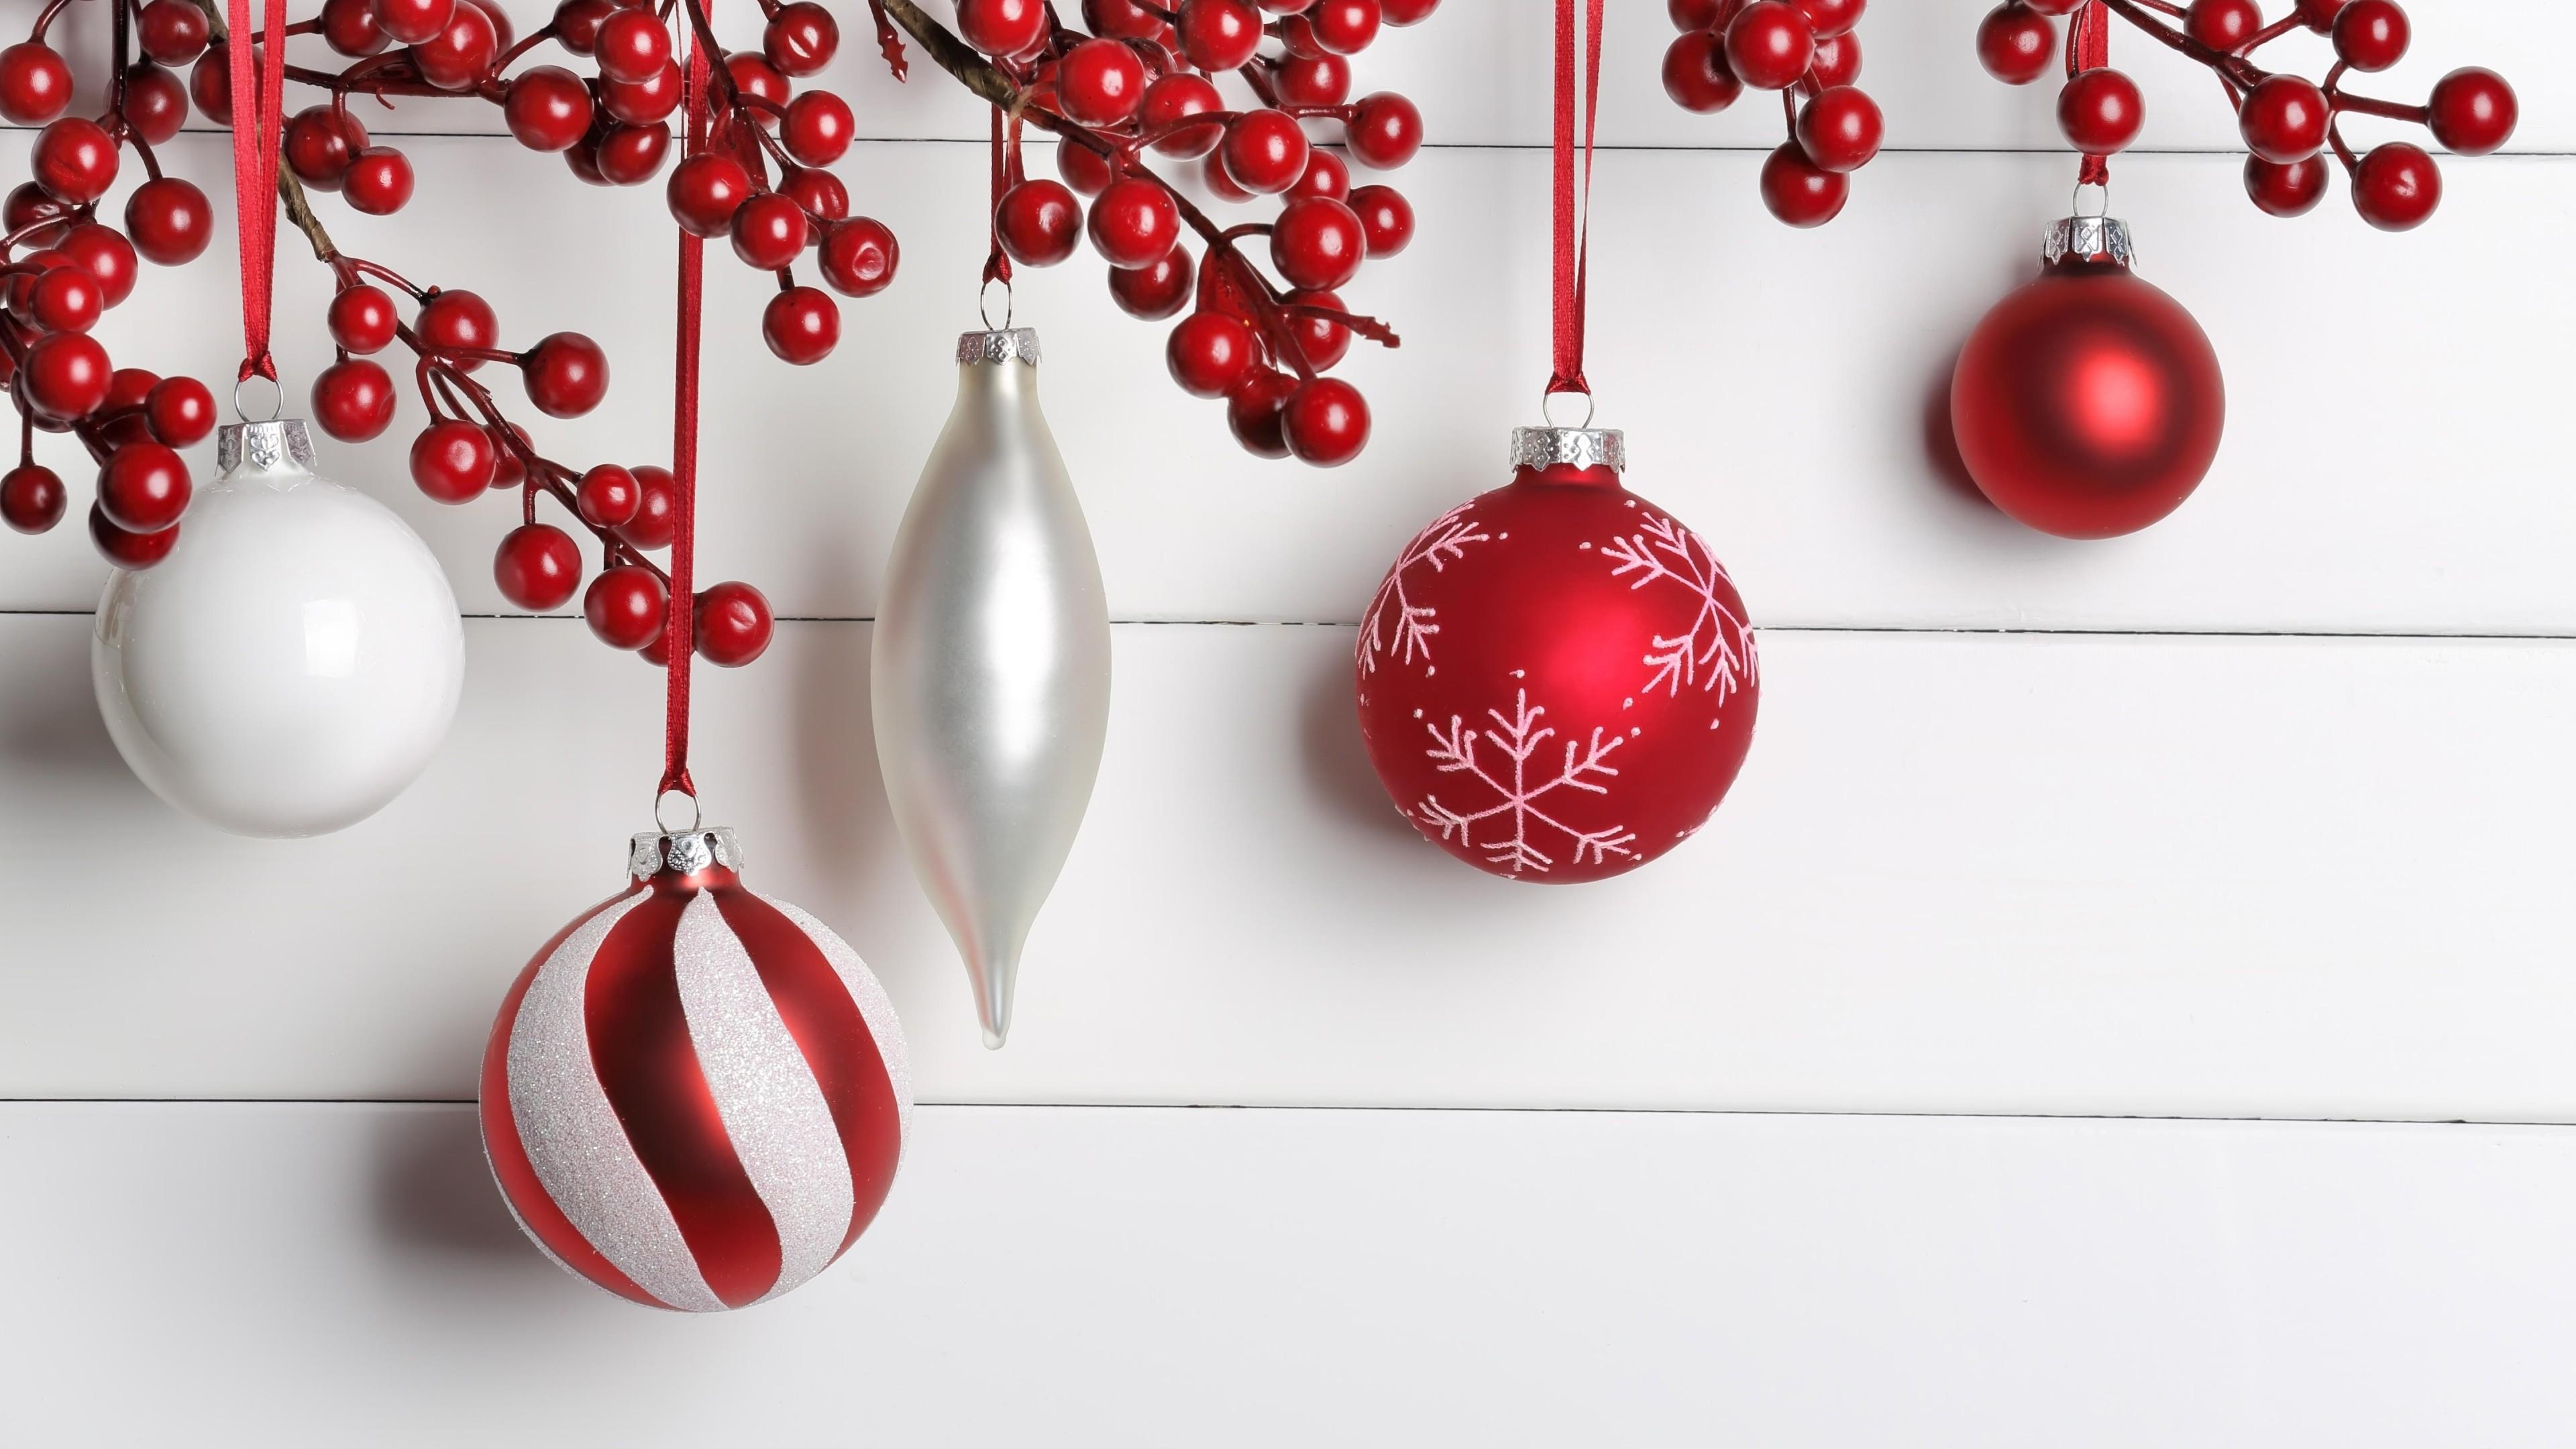 Wallpaper Christmas, New Year, Balls, Decorations, 5K, Holidays 5K, Balls,